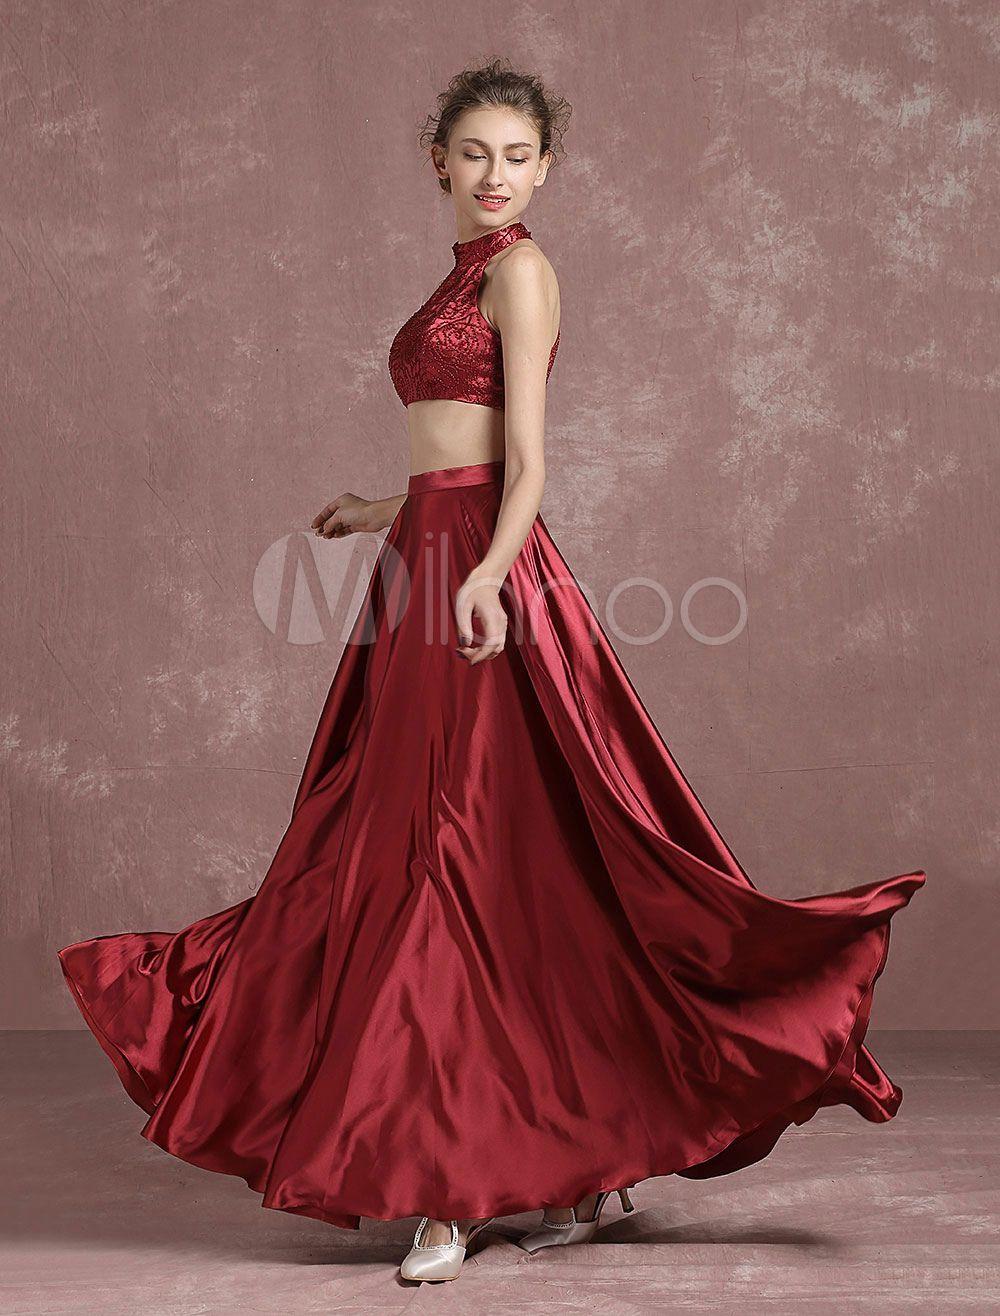 d87dceeef21 Crop Top Prom Dress 2018 - Data Dynamic AG